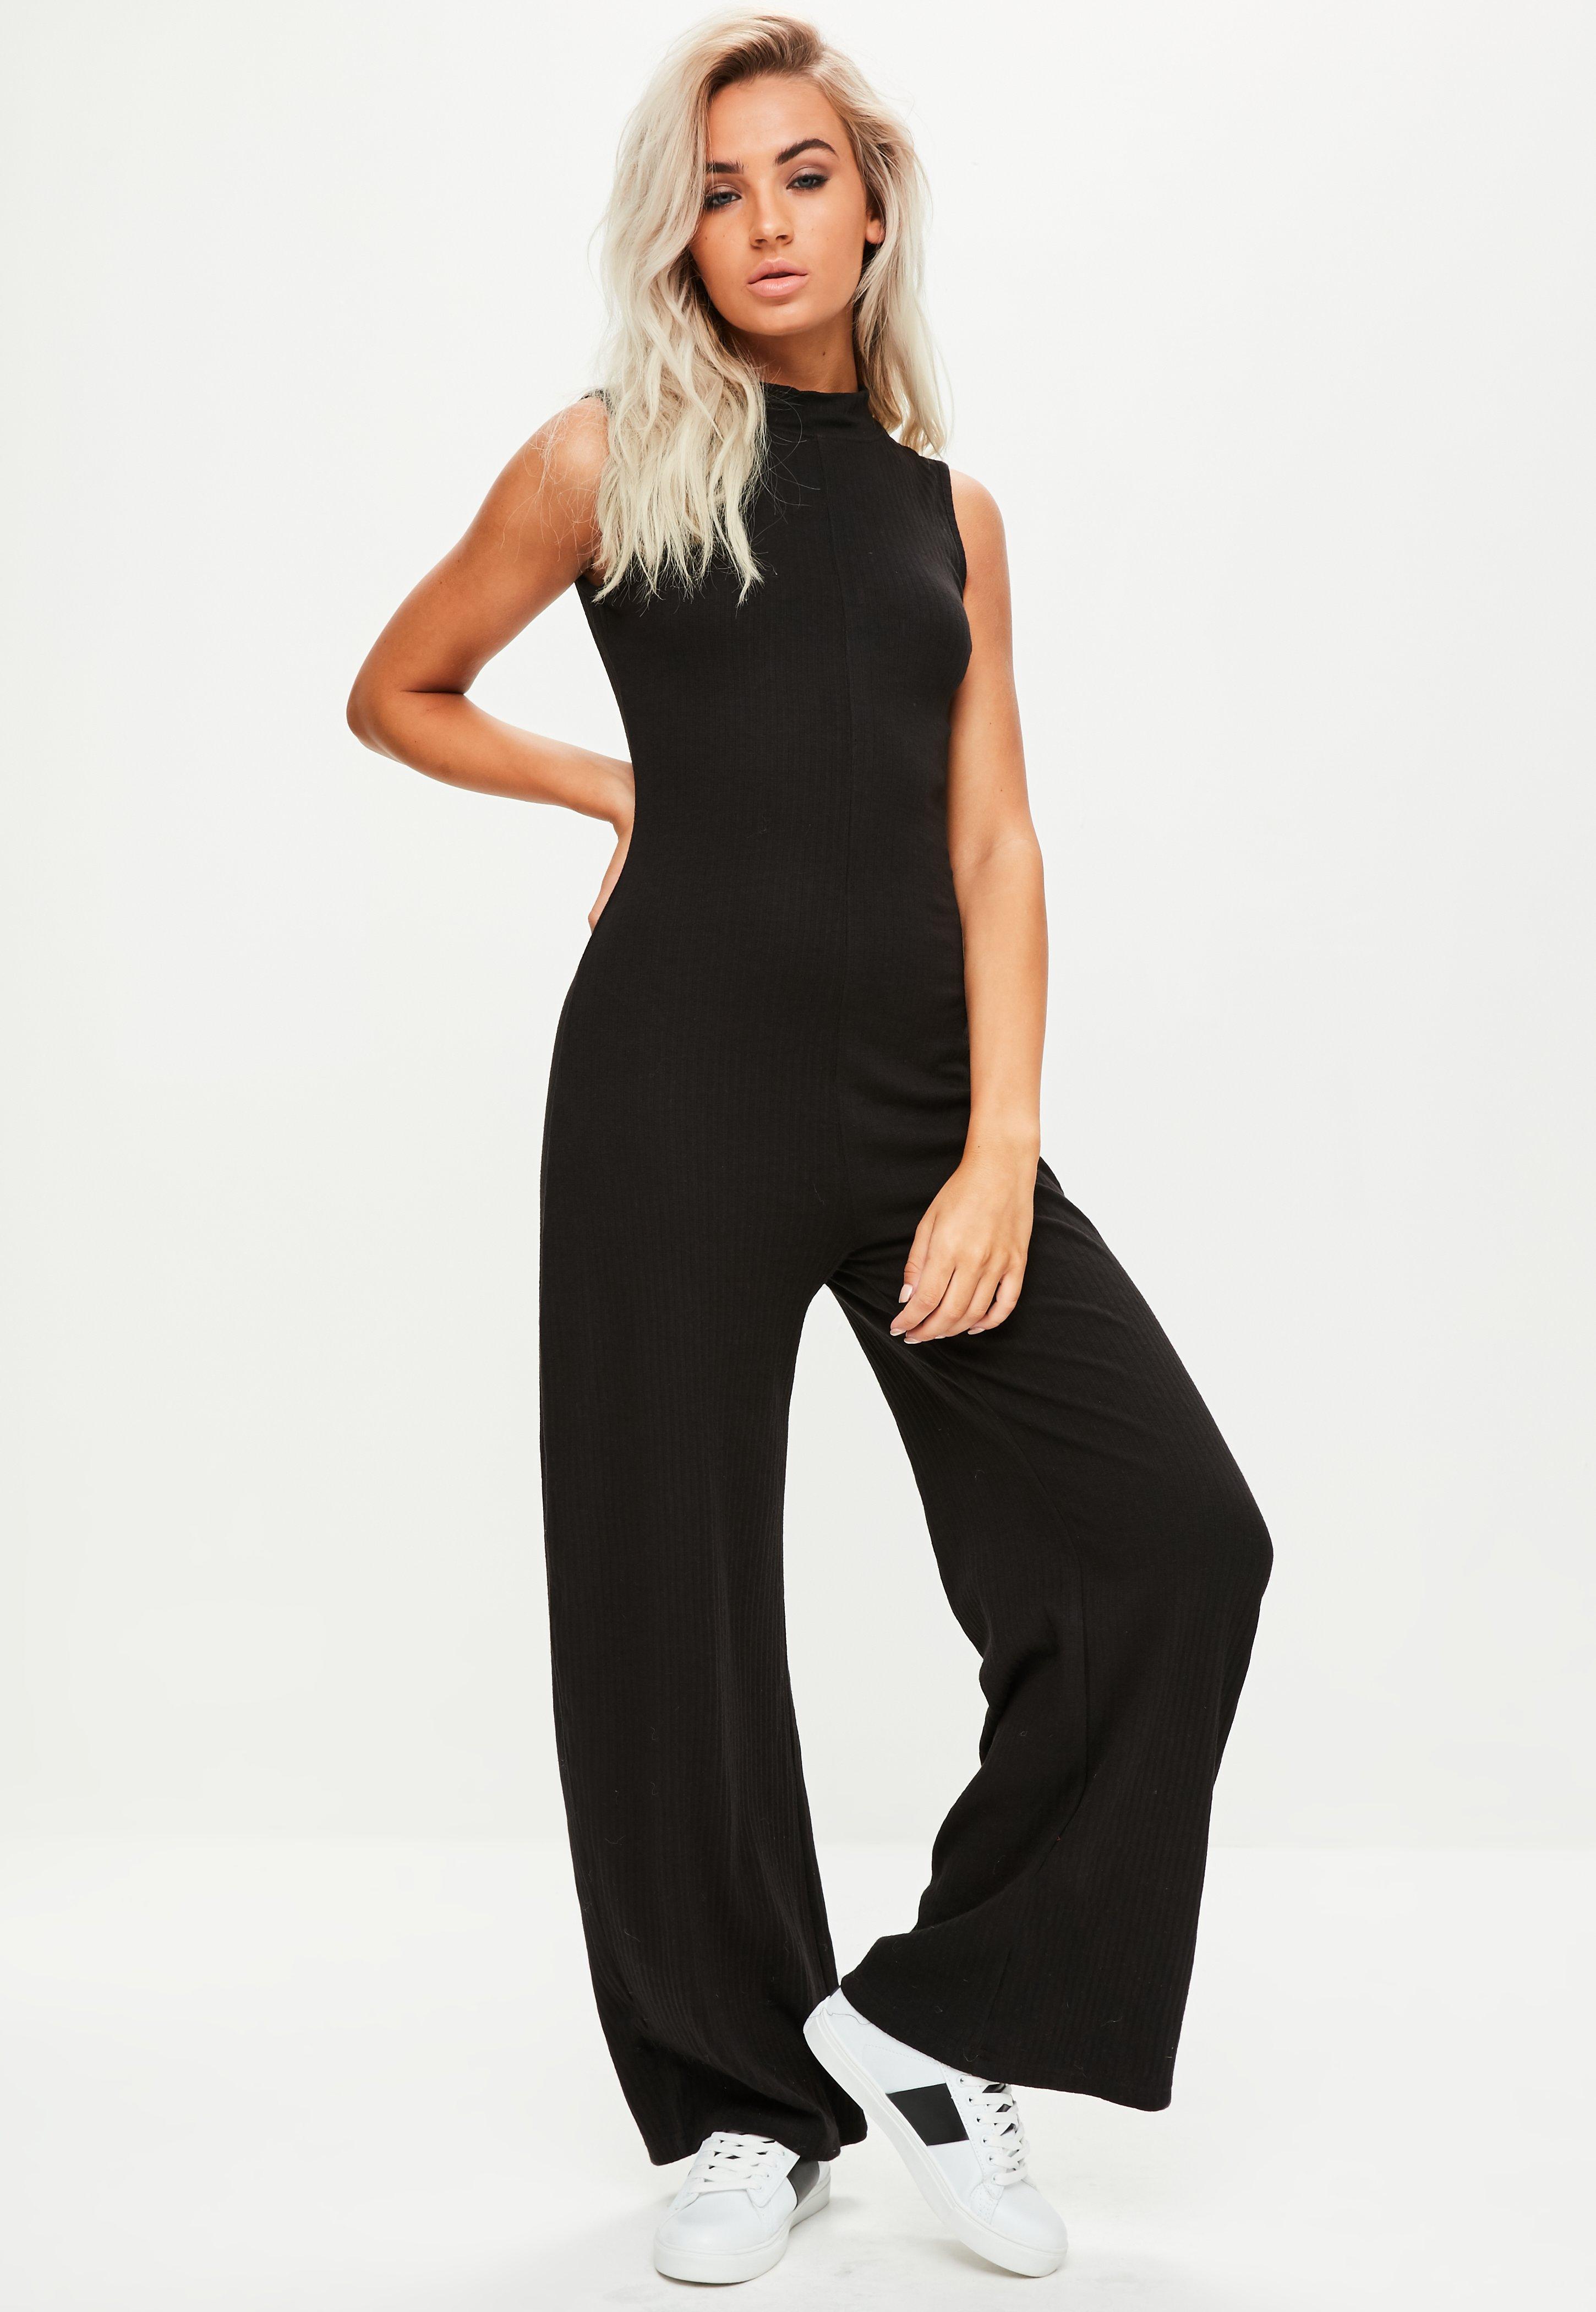 06de2faad37b Black High Neck Sleeveless Jumpsuit